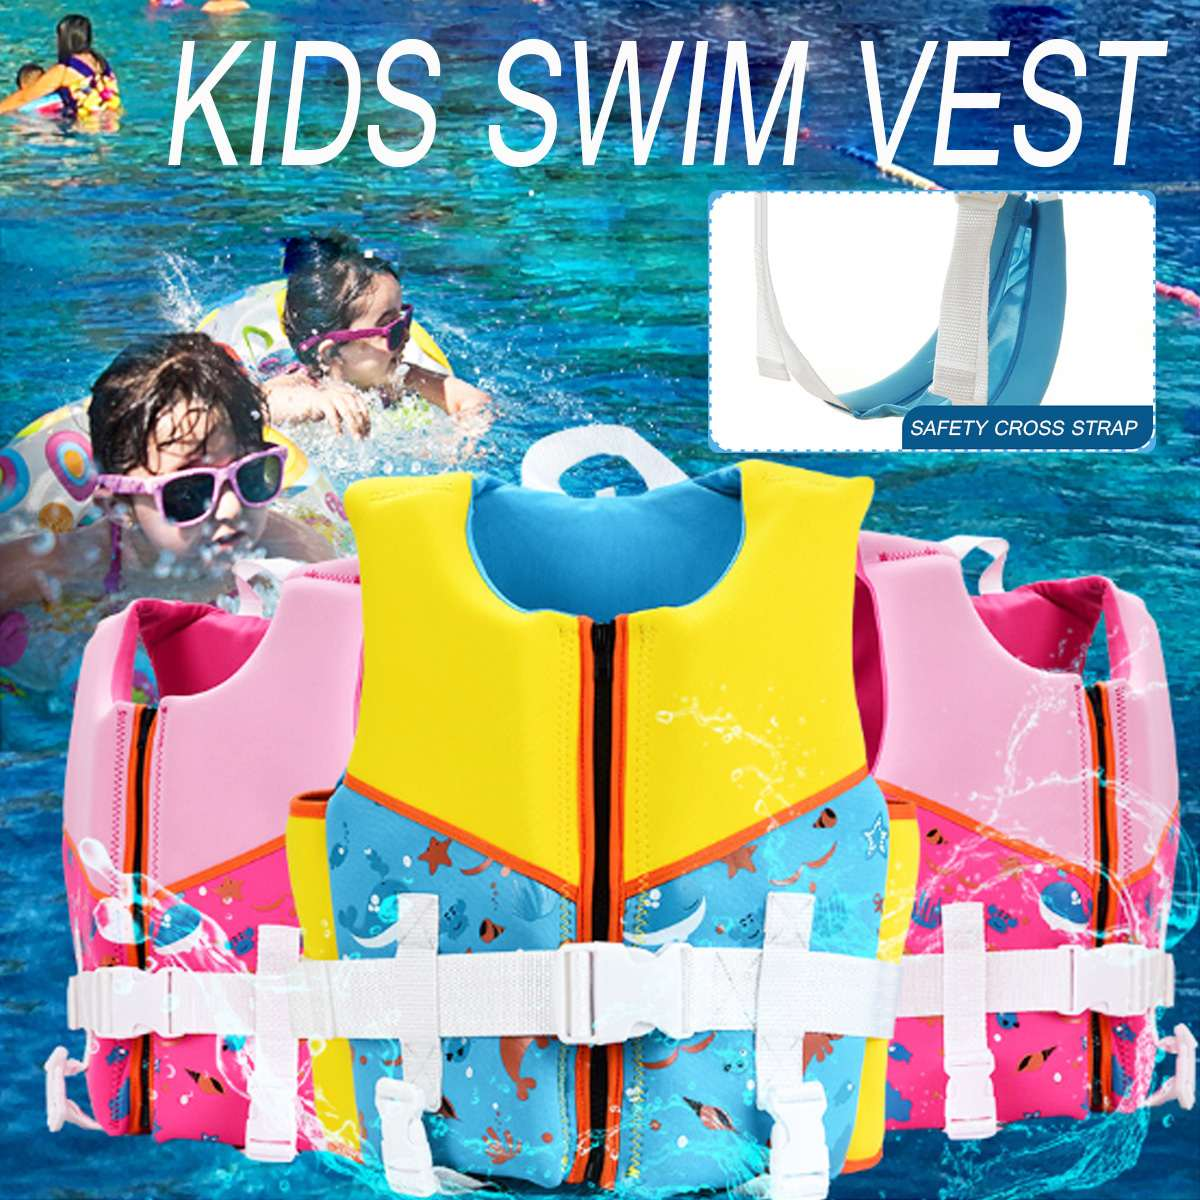 Children Life Vest Girls Jacket Boy Swimsuit Swimming Life Jacket for Water Sports Surfing Floating Kids Baby Safety Vest